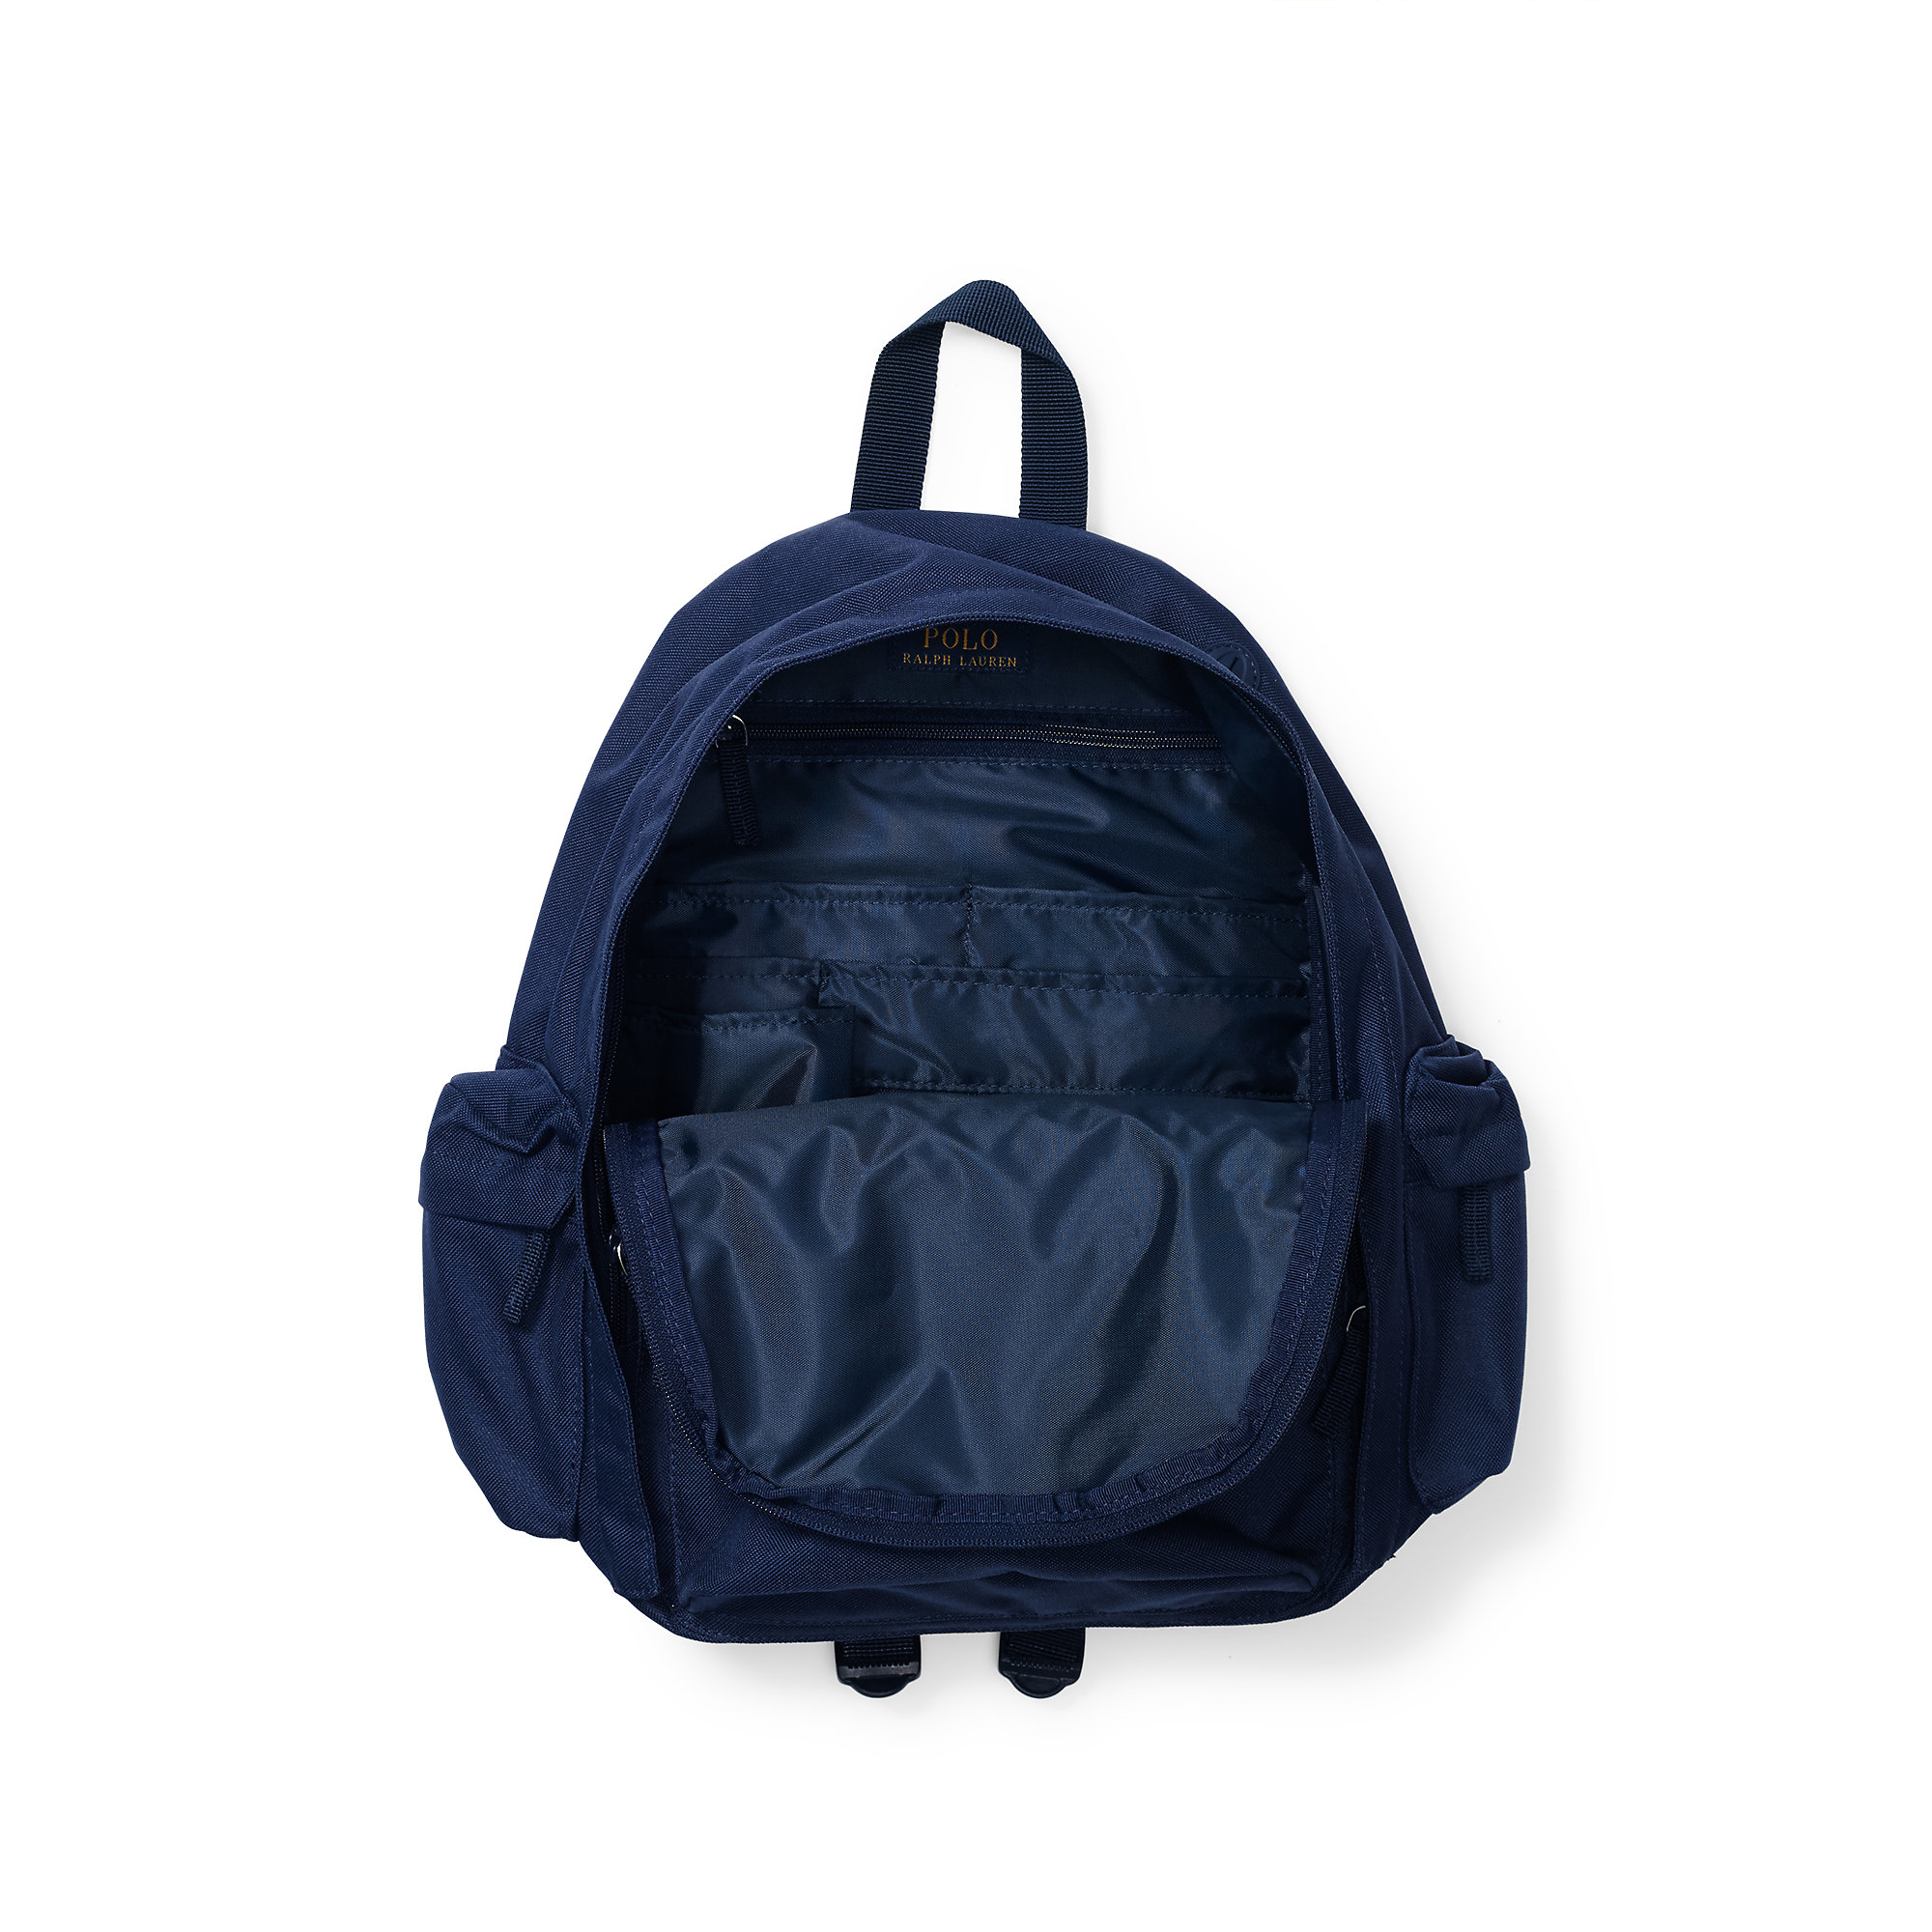 7fb34e5dc10a Lyst - Ralph Lauren Medium Big Pony Backpack in Blue